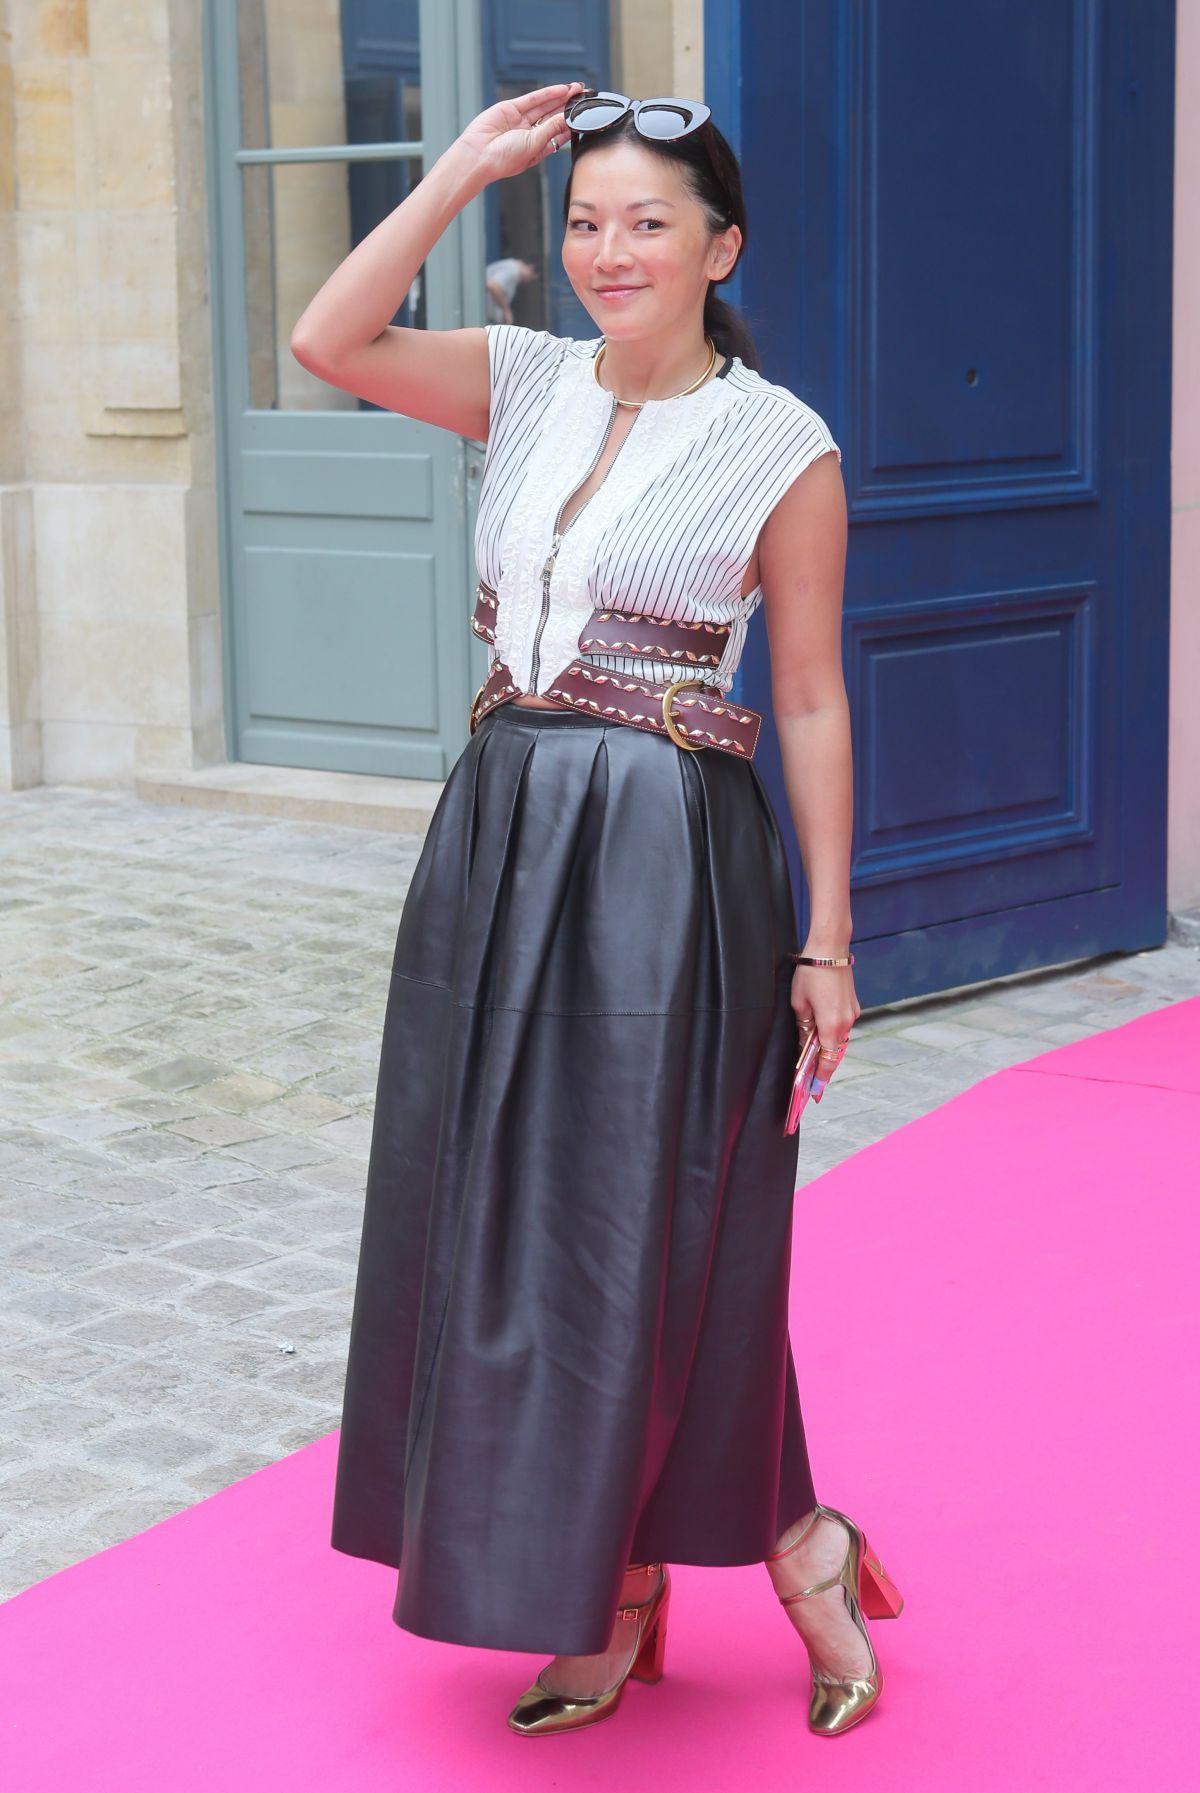 TINA LEUNG at Schiaparelli Haute-couture Fashion Show in Paris 07/04/2016